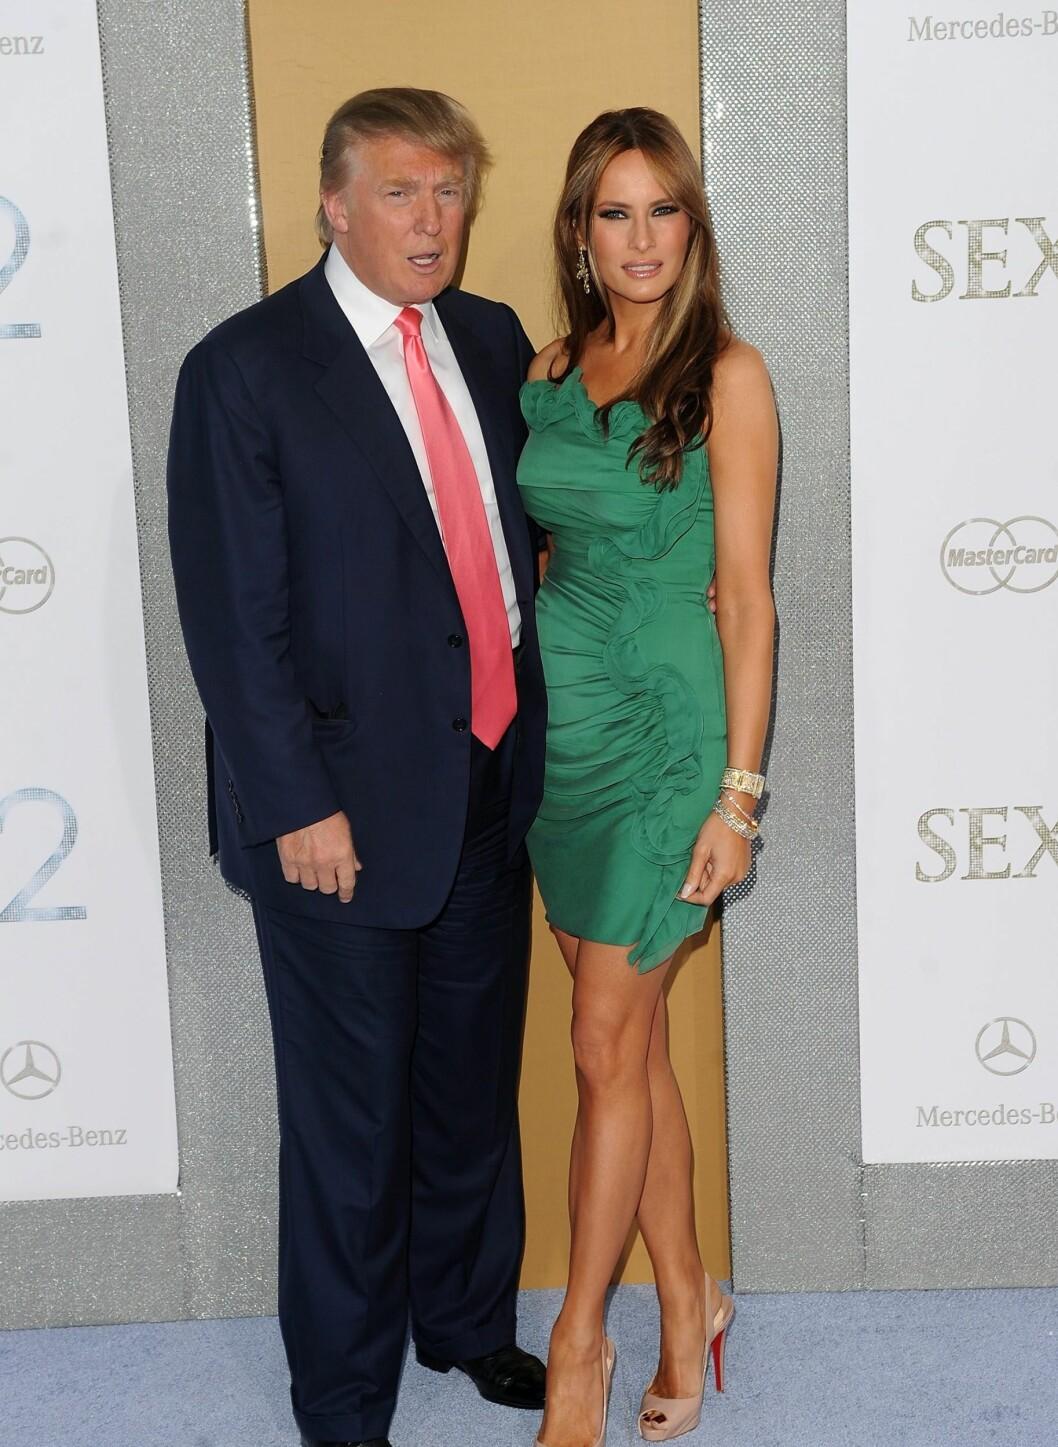 Donald Trump and Melania Trump var også på premieren i Radio City Music Hall i New York City.   Foto: All Over Press